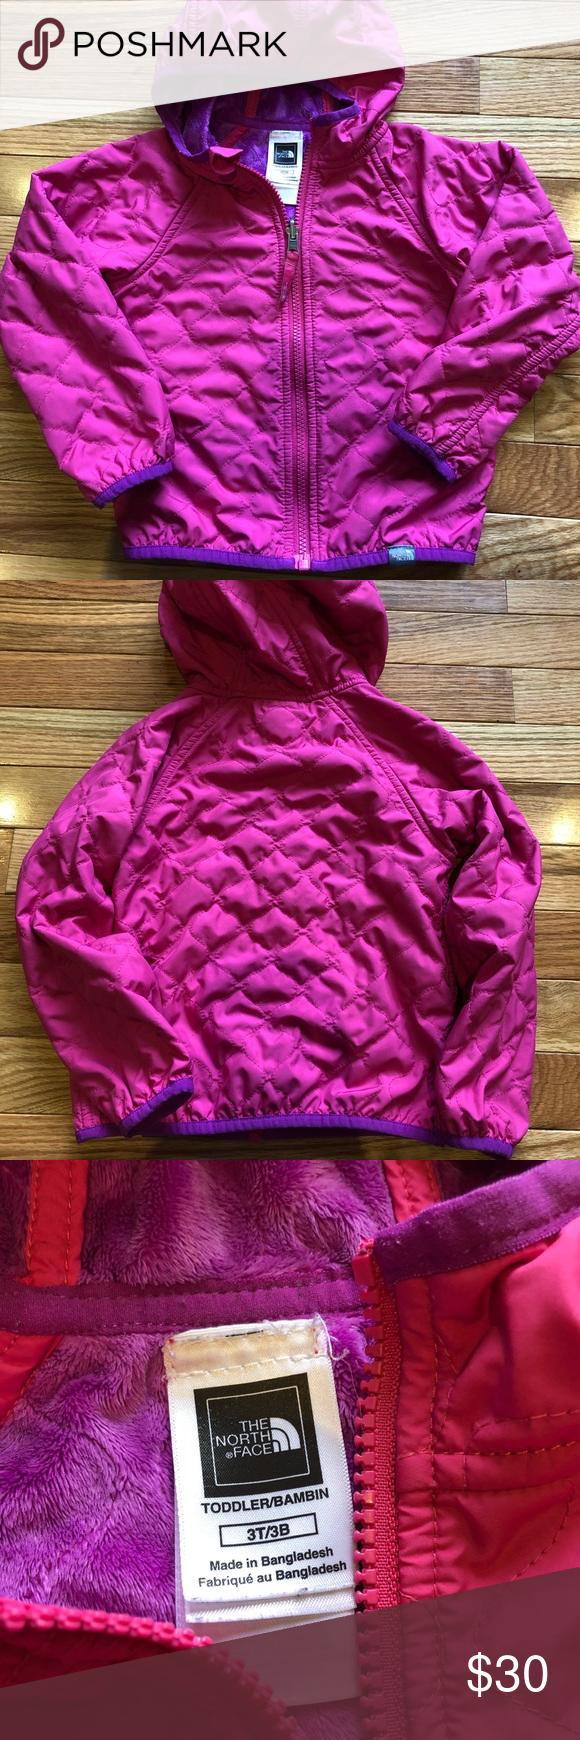 North Face Jacket 3t Vguc Toddler North Face Jacket Jackets Fall Jackets [ 1740 x 580 Pixel ]